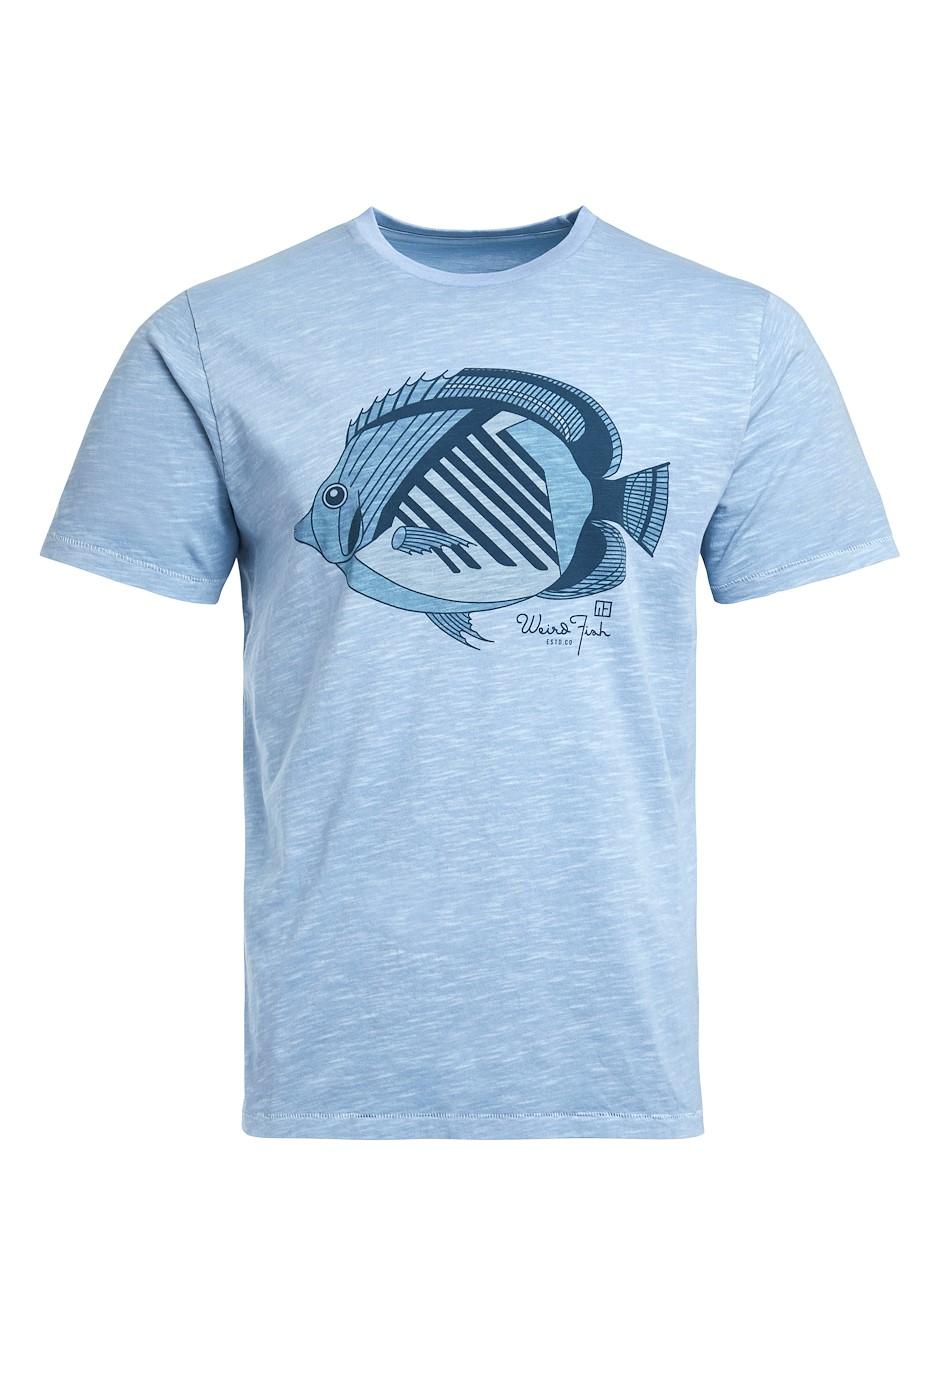 Raw Fish Organic Cotton Graphic T-Shirt Pale Denim